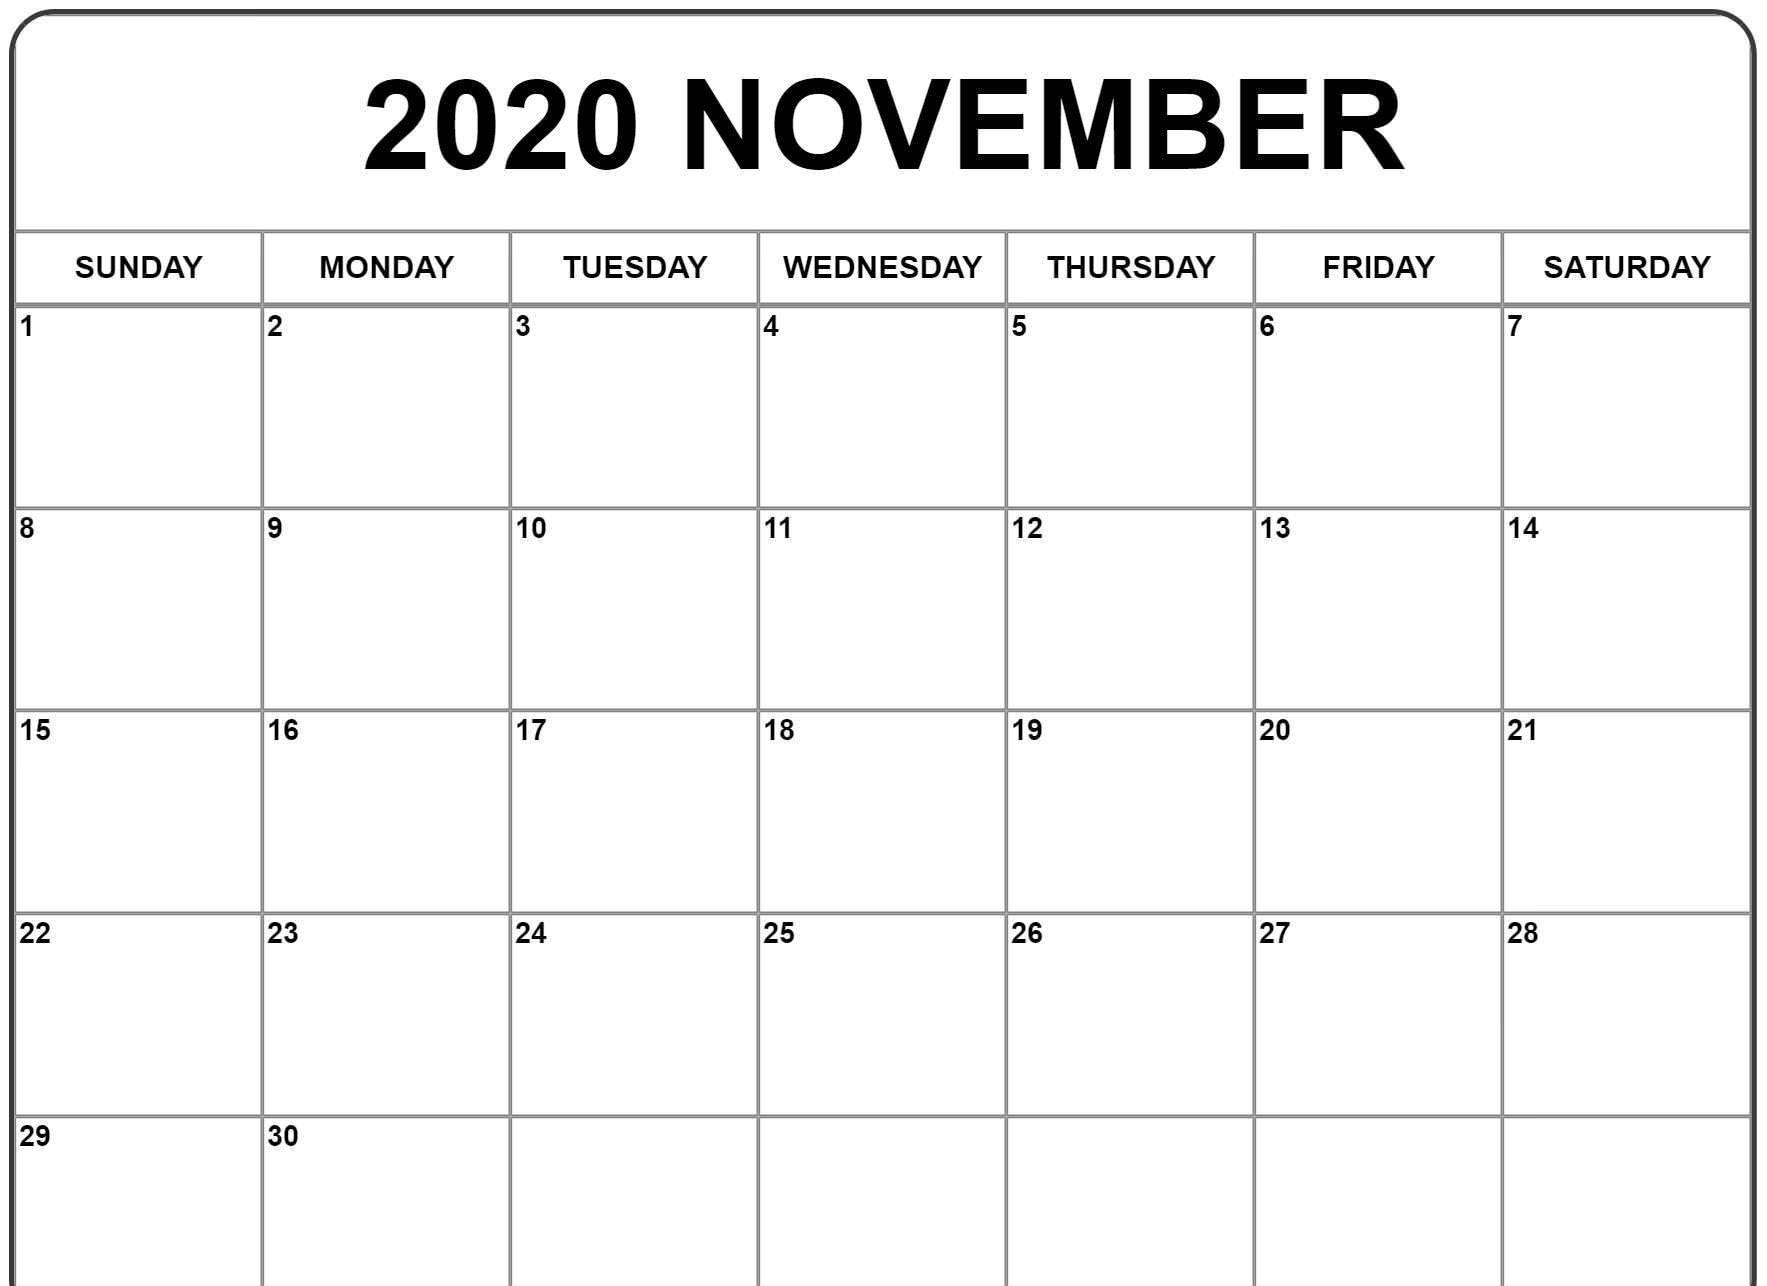 November 2020 Calendar | Monthly Calendar Template, Free